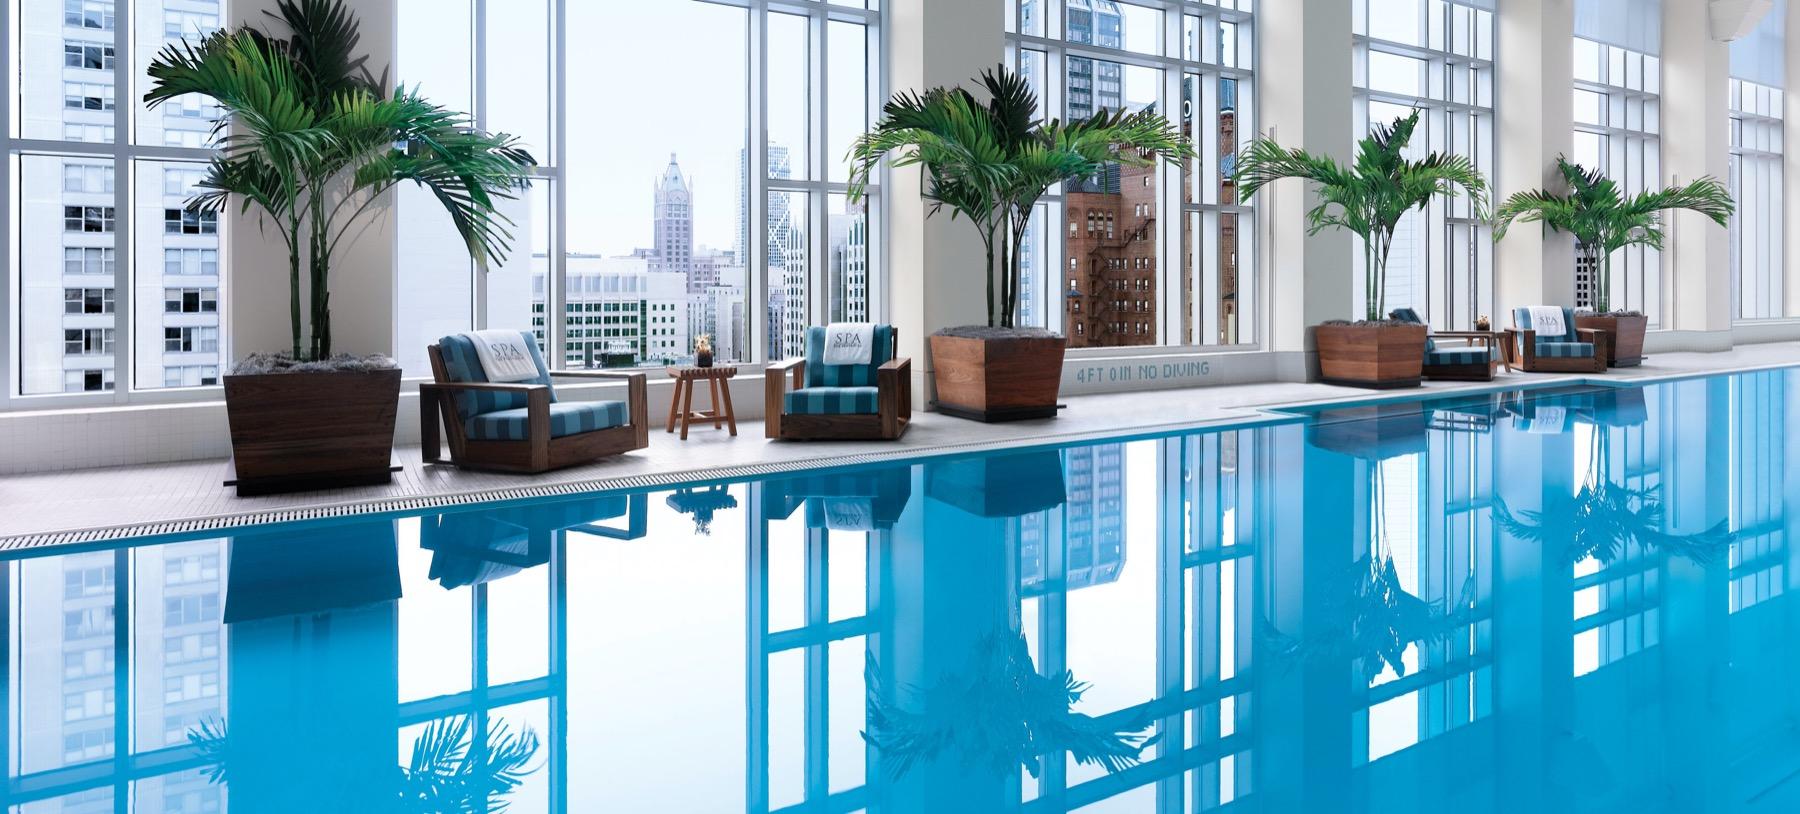 Pool at Peninsula Chicago